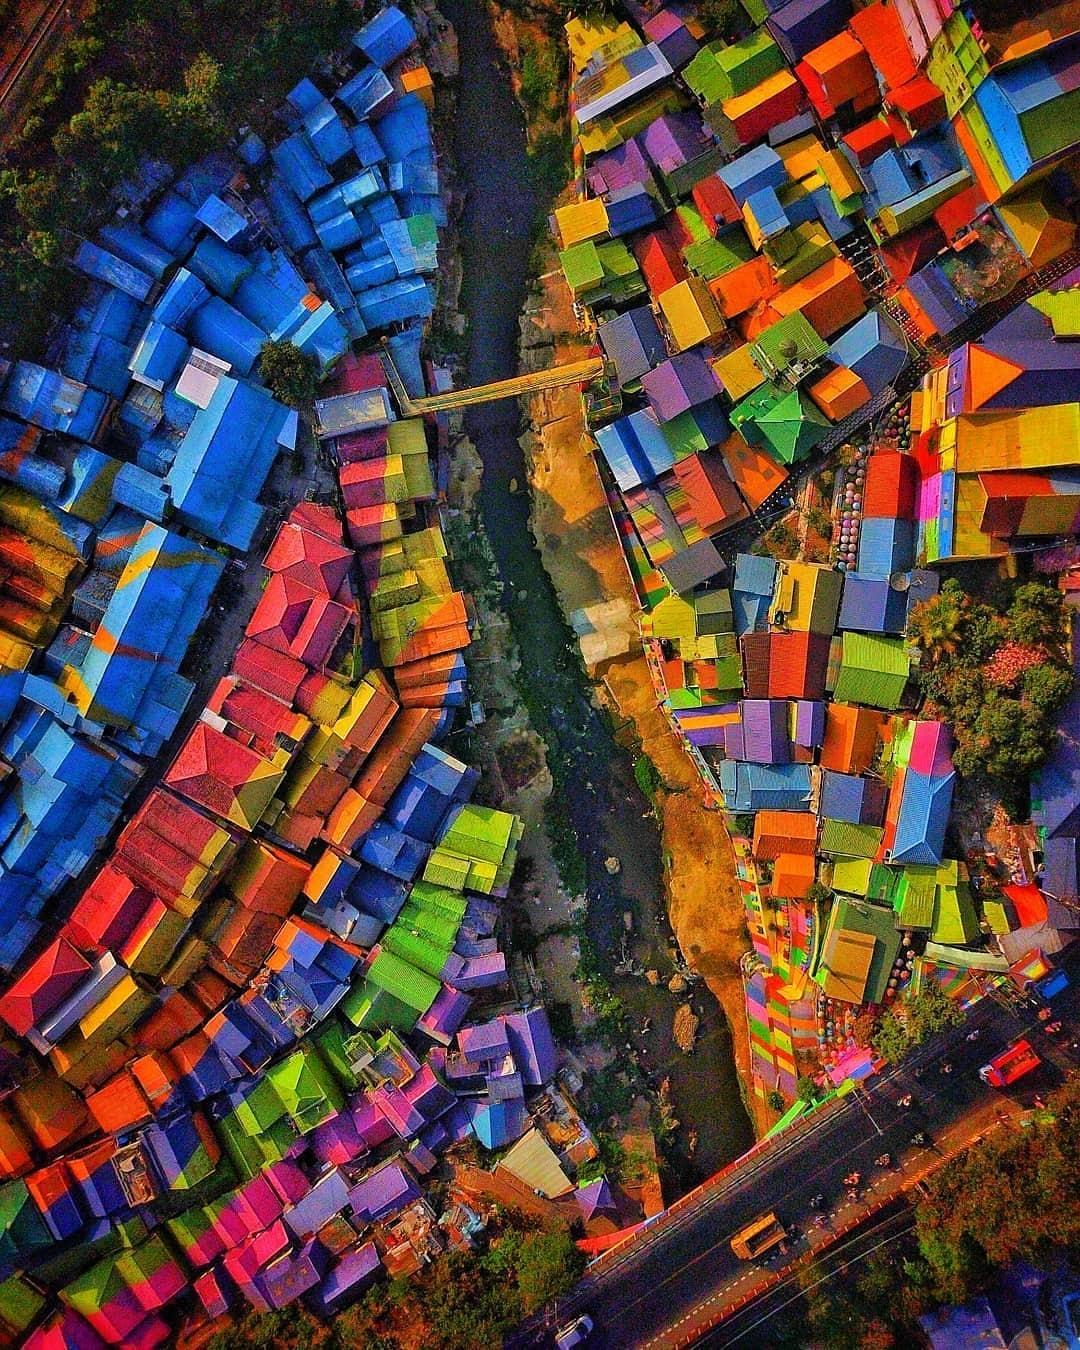 Kampung Warna Warni Jodipan Kota Malang Jawa Timur